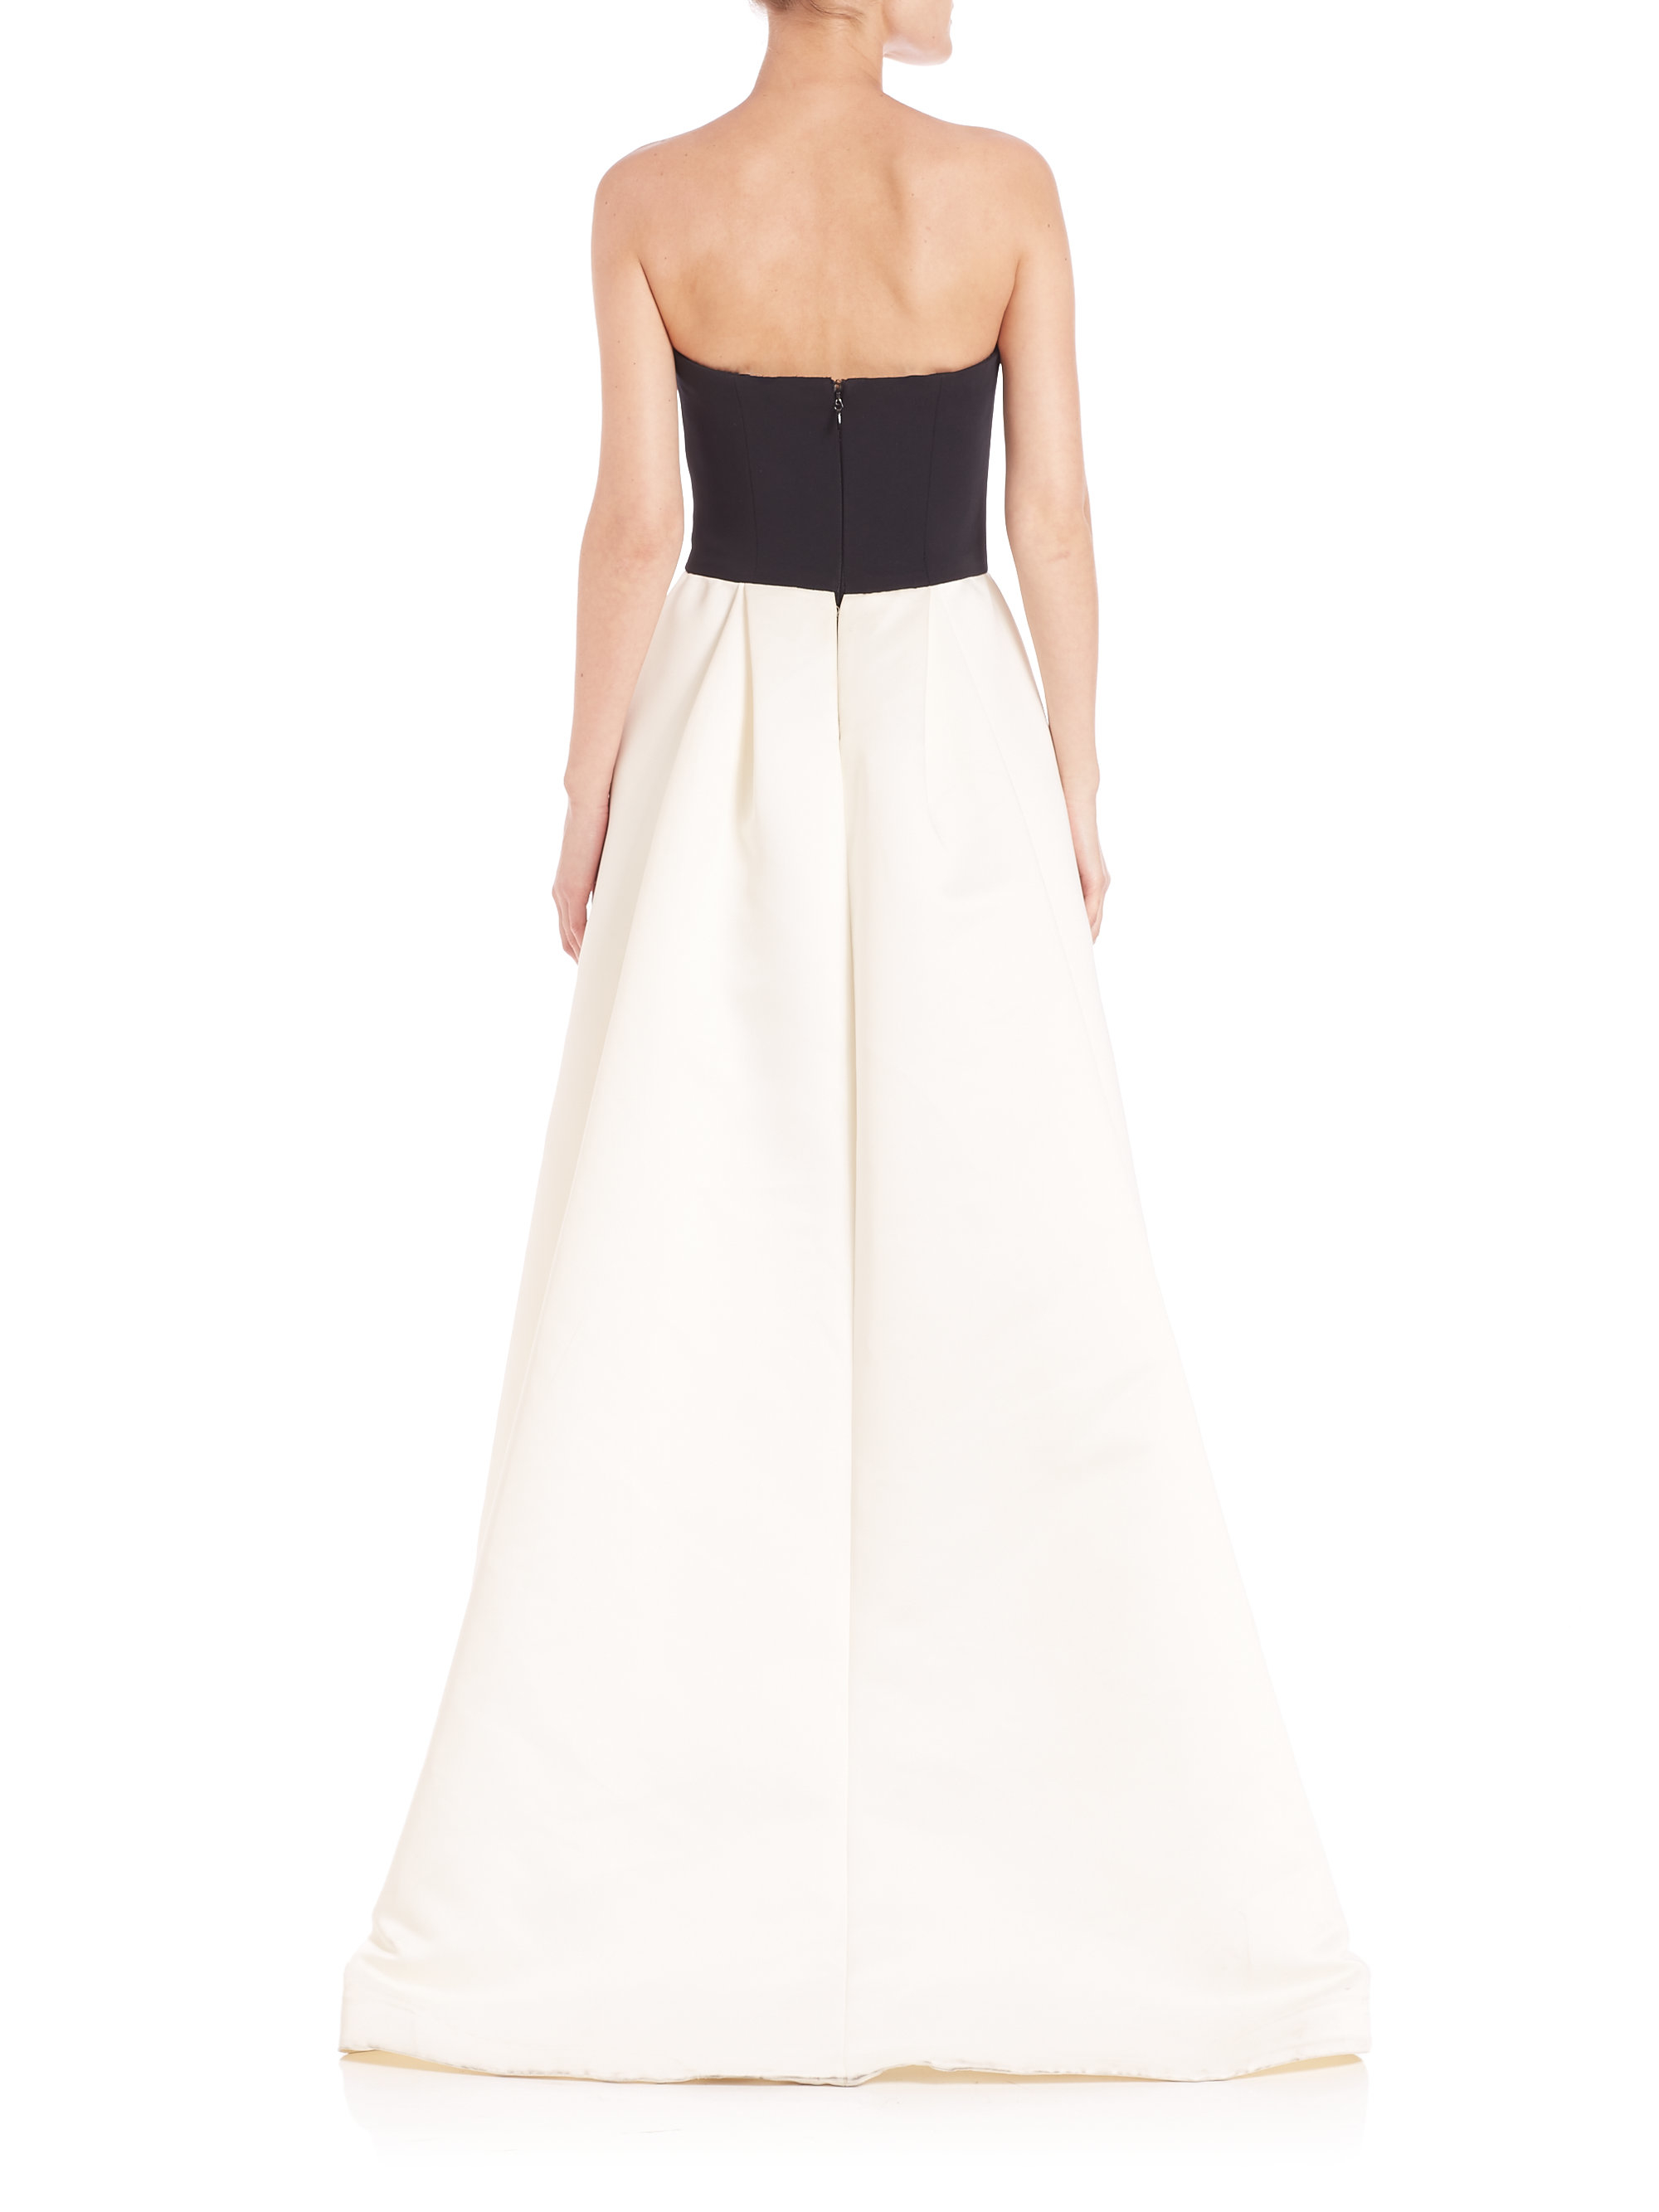 Lyst - Halston Strapless Hi-lo Ball Gown in Black